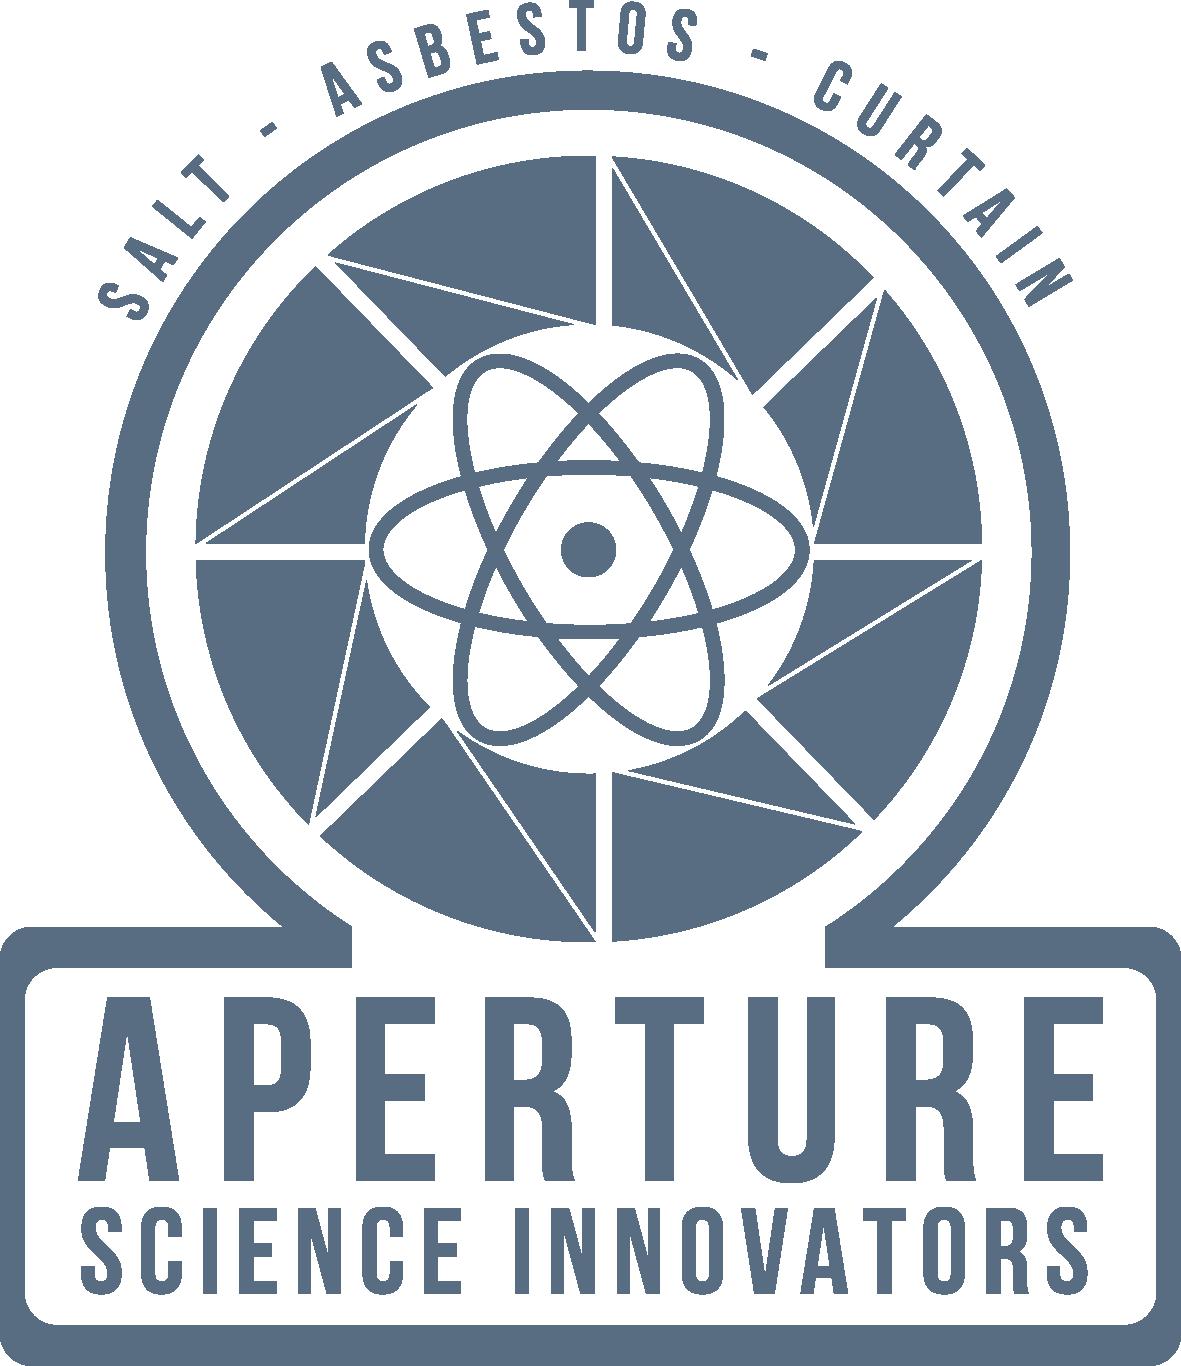 Aperture Science Innovators Logo photo - 1